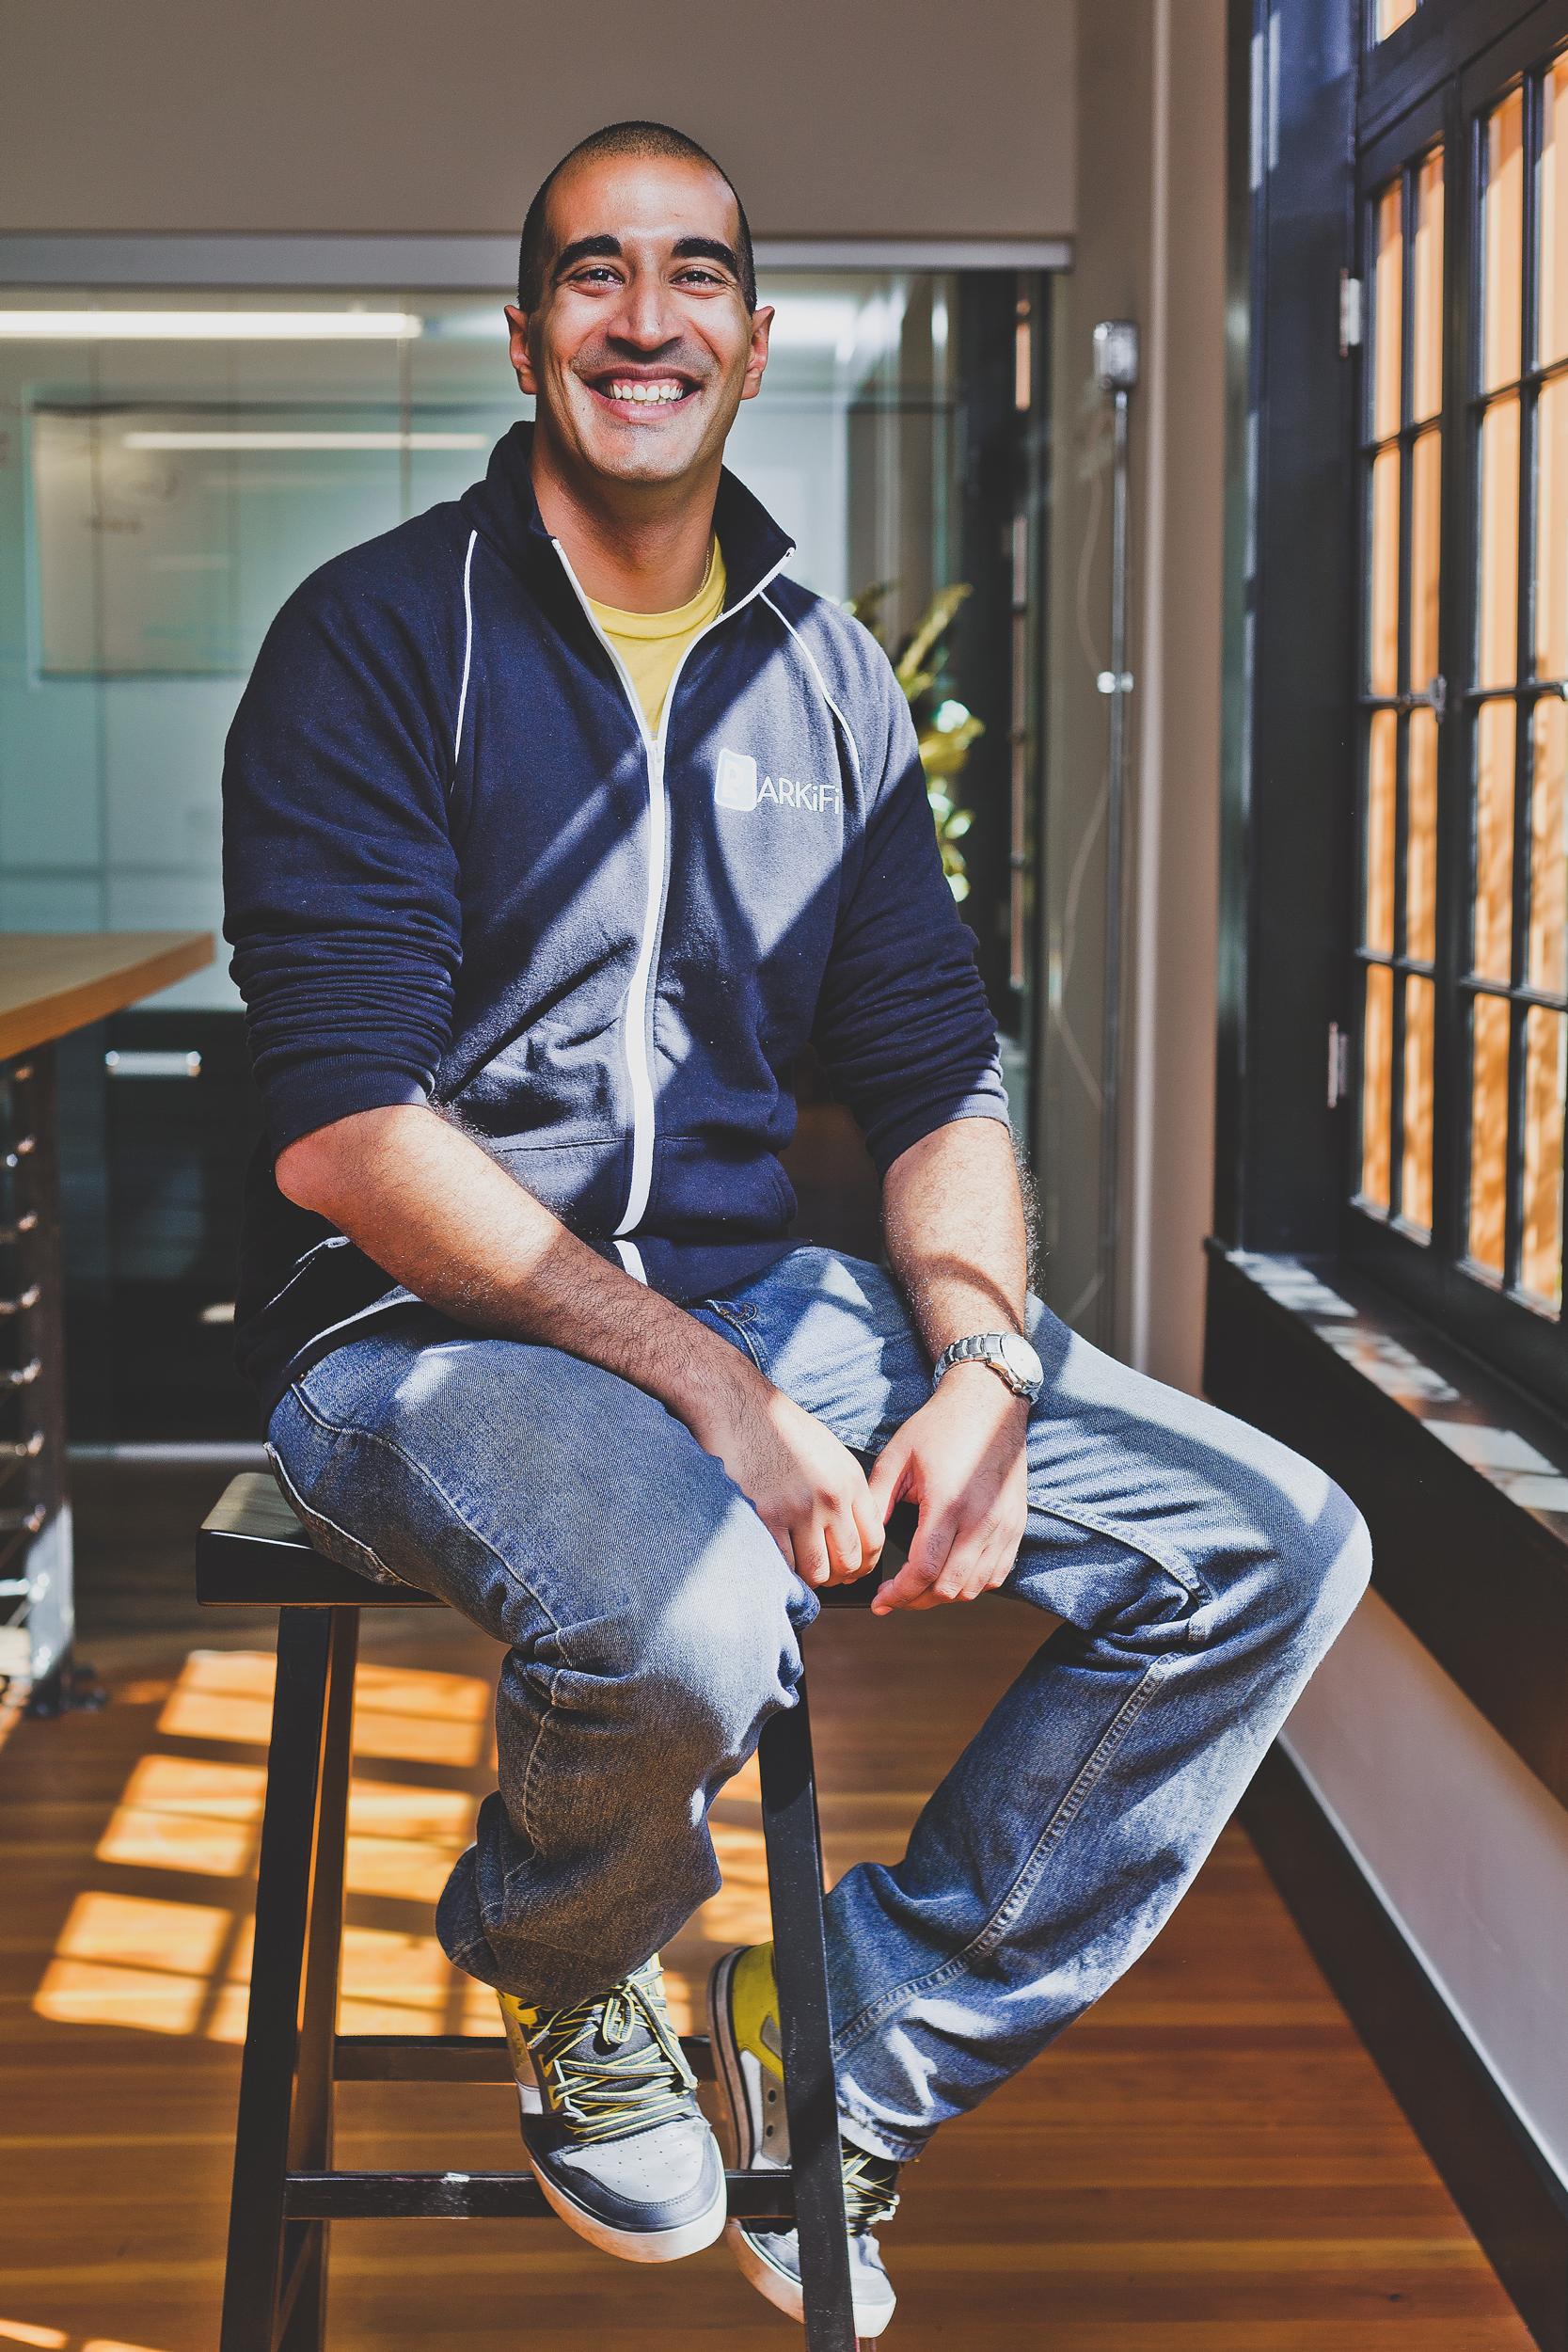 Rishi Malik, Parkifi Co-Founder & CTO